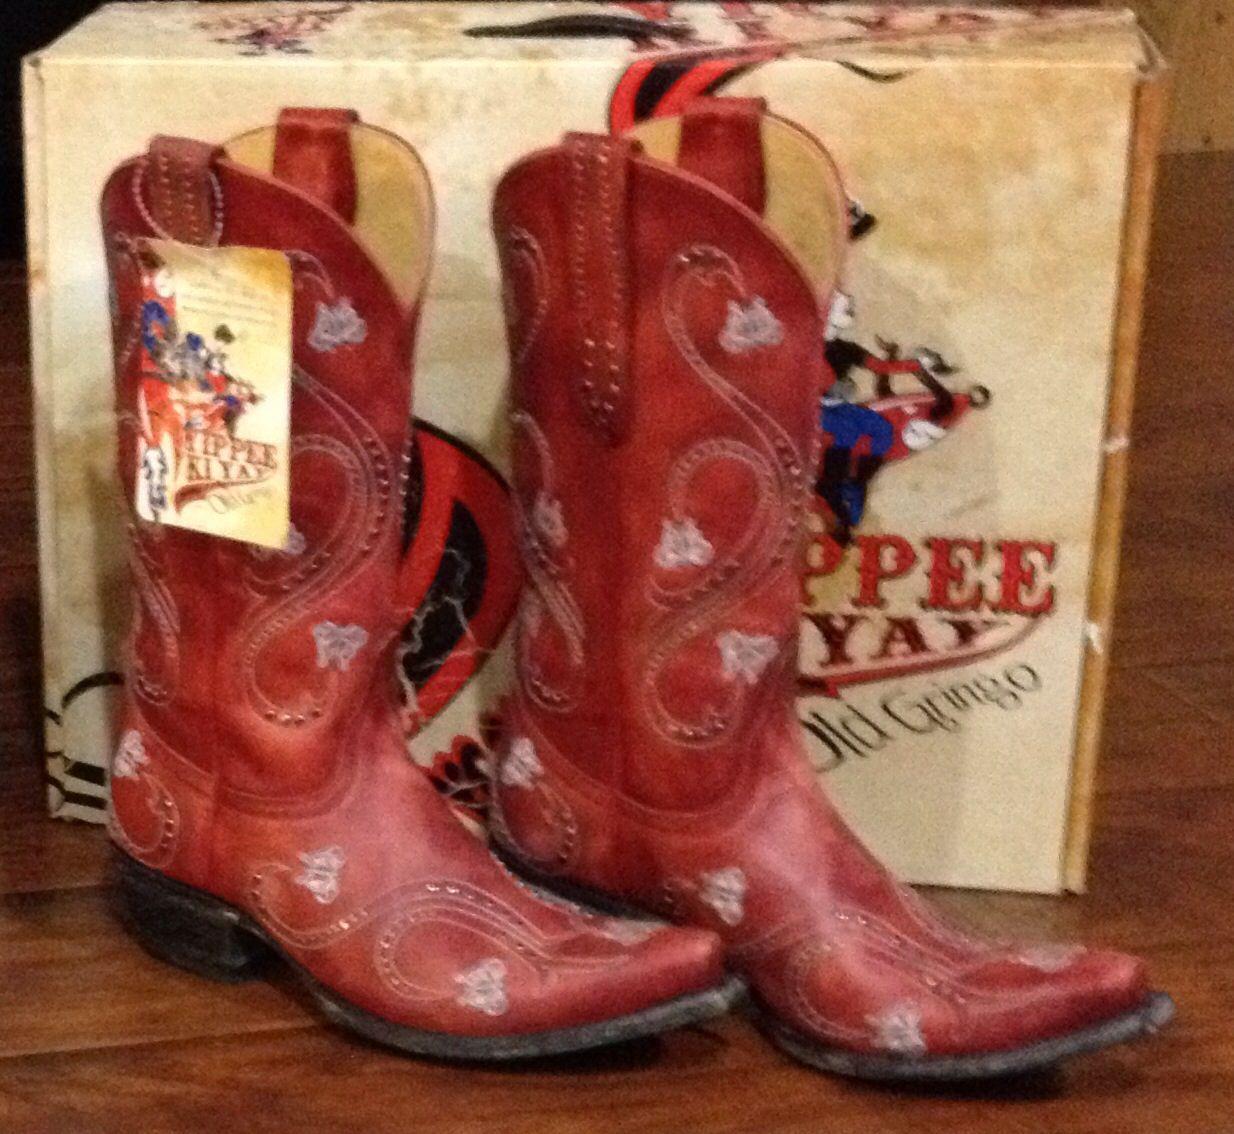 Red Old Gringo Yippee Ki Yay Angelina Cowboy boots